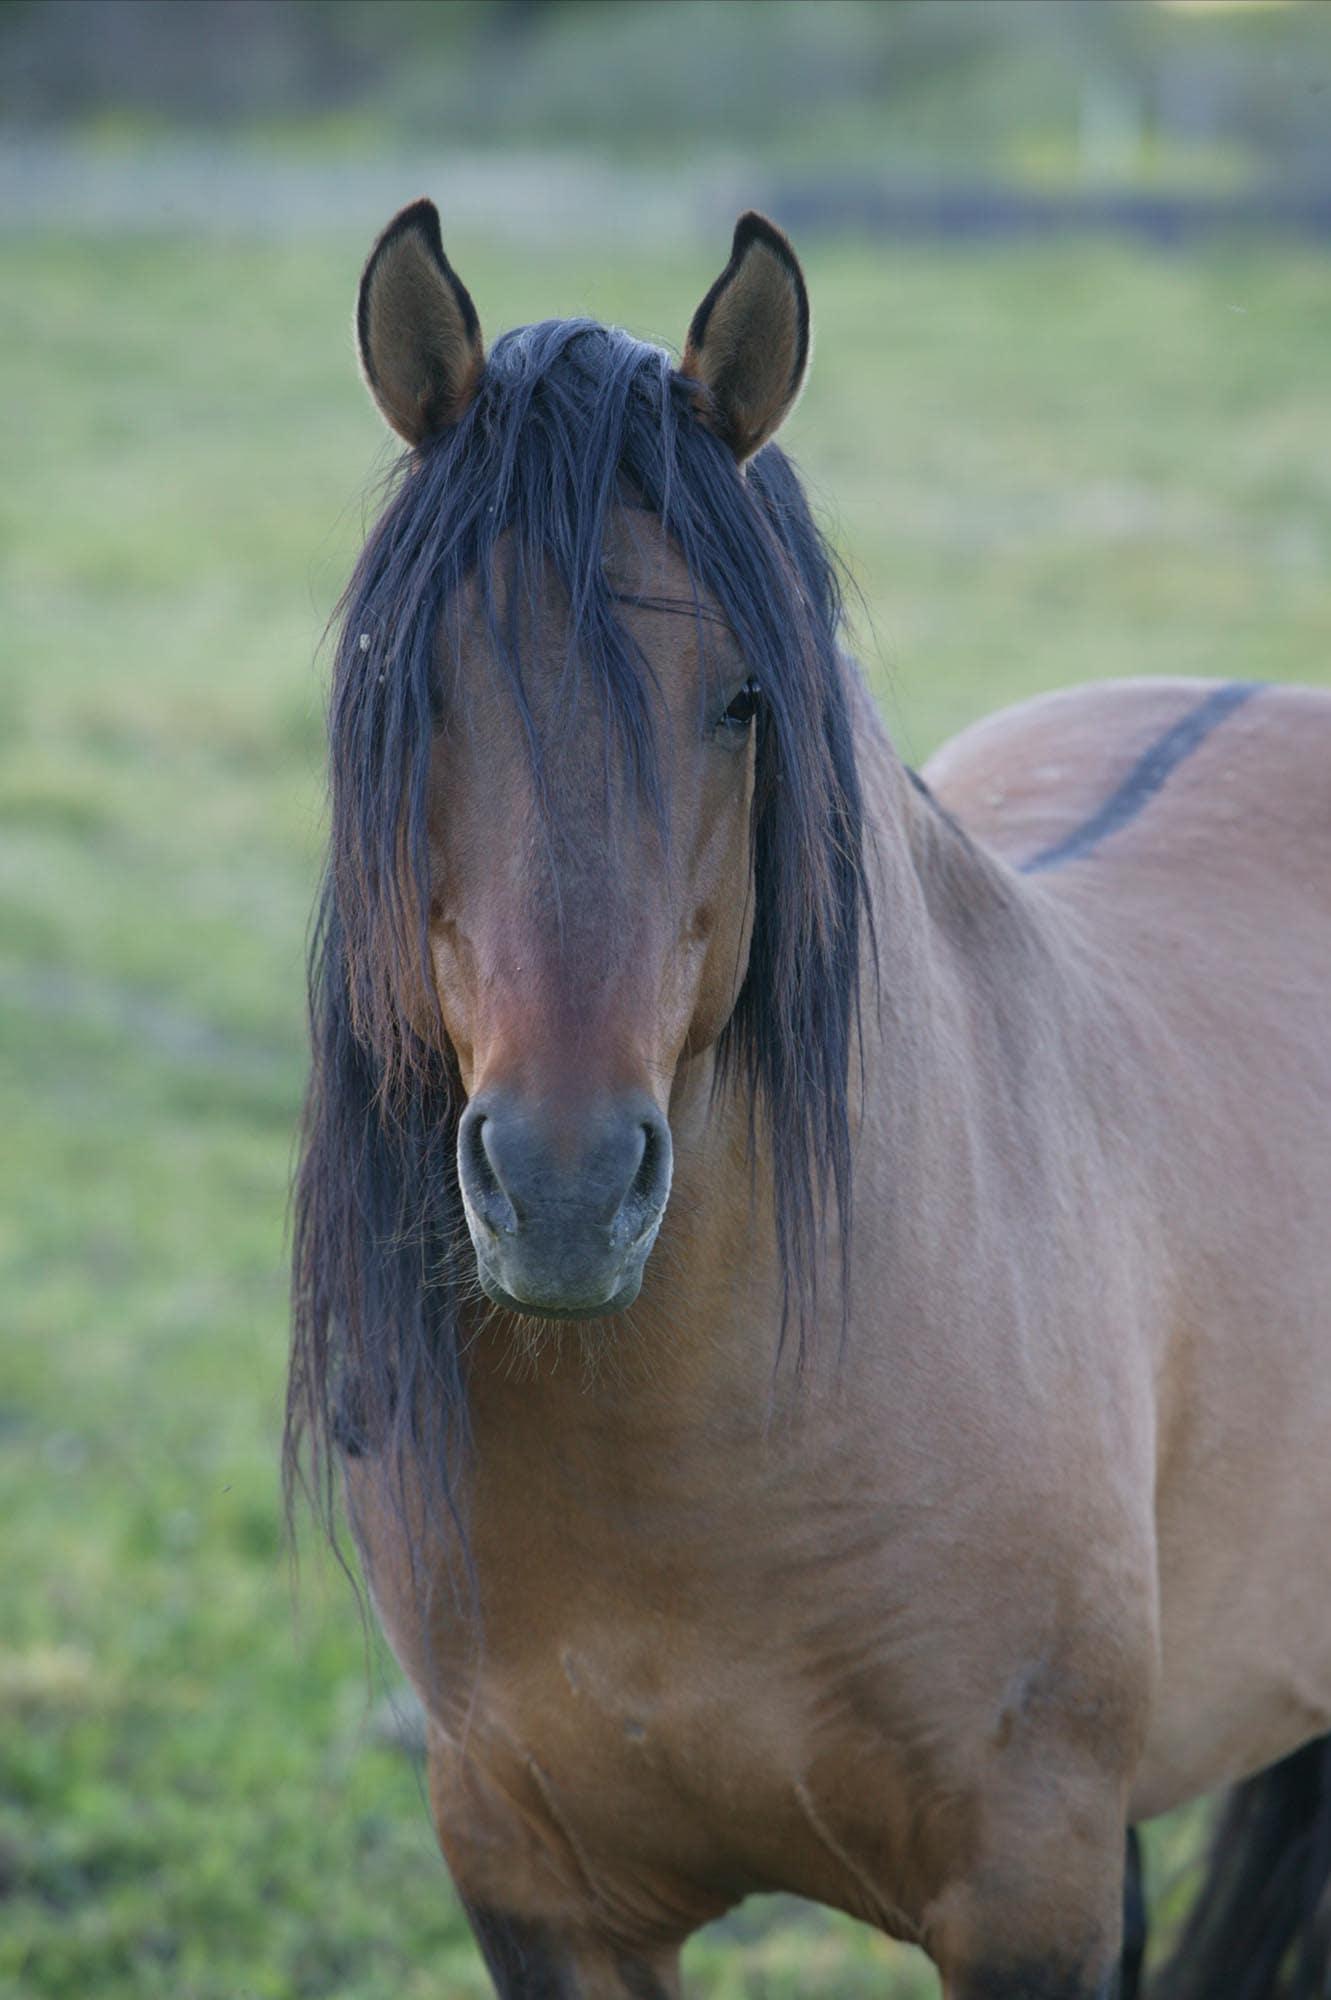 Mustang Sulphur Spring Chief in California